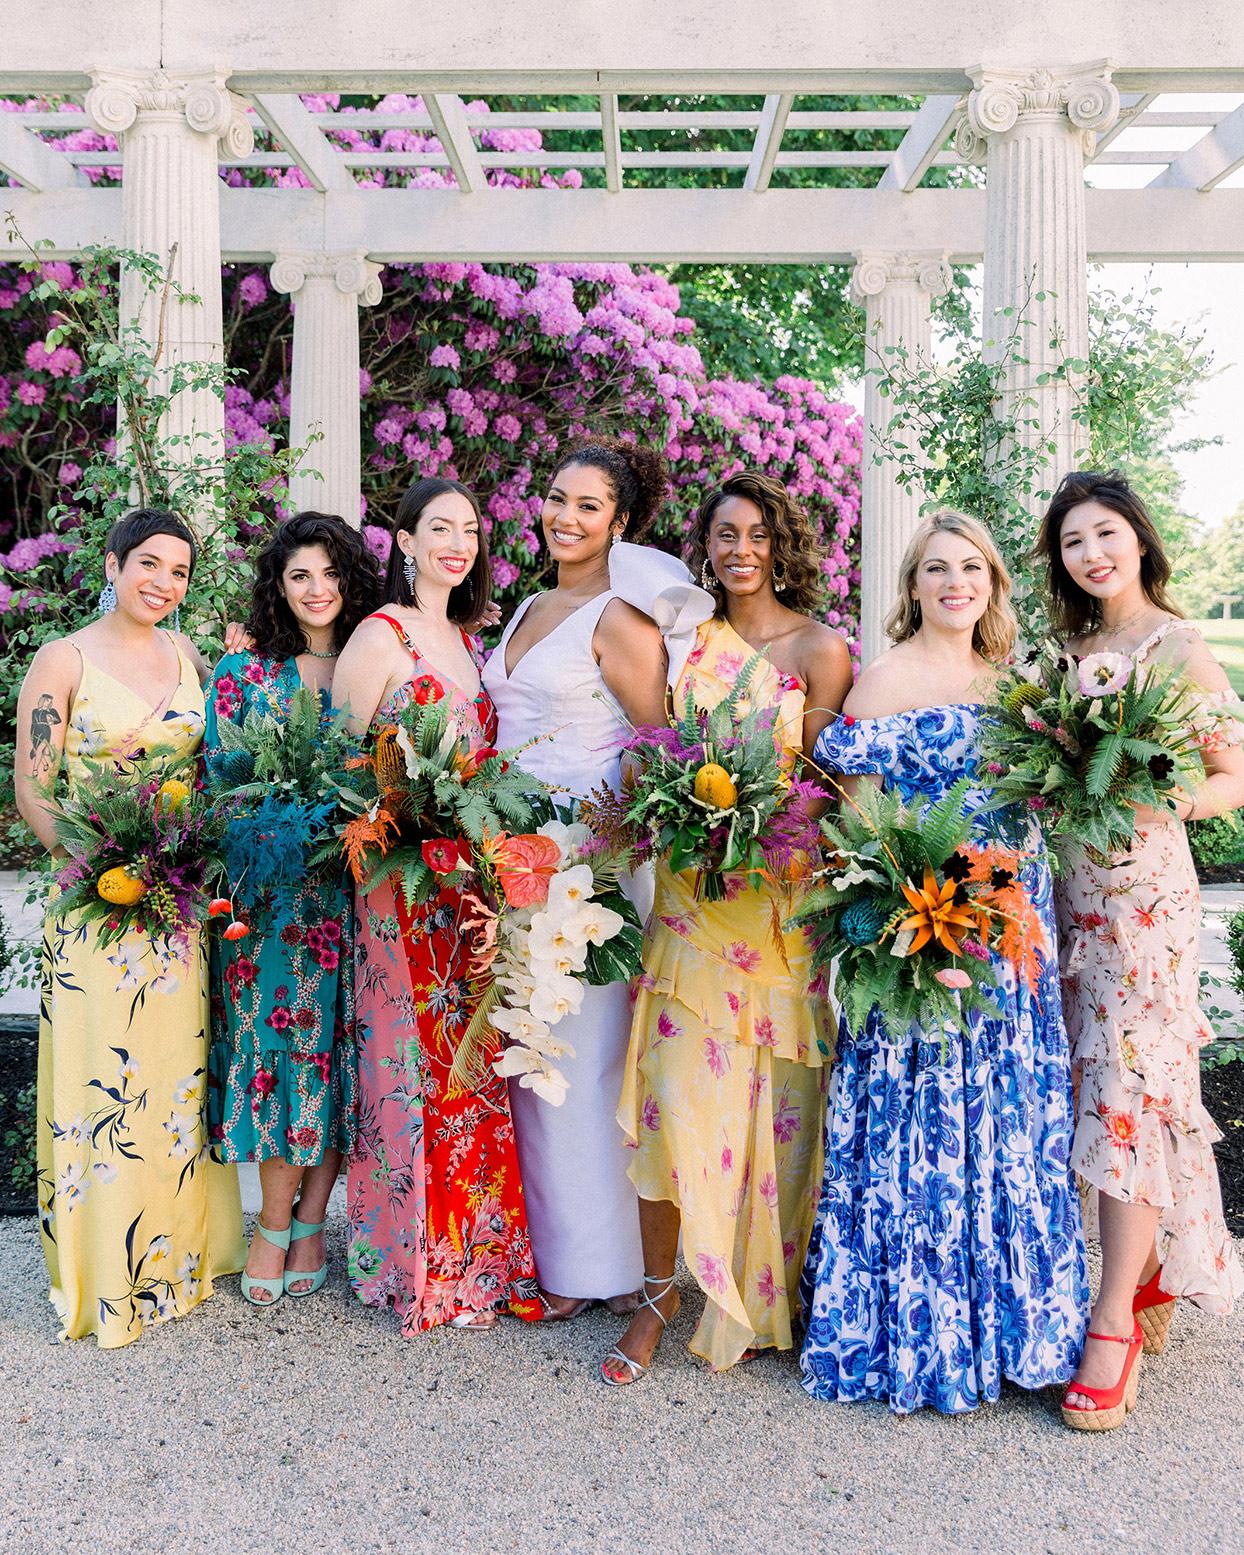 dalila elliot wedding bridesmaids in floral patterns